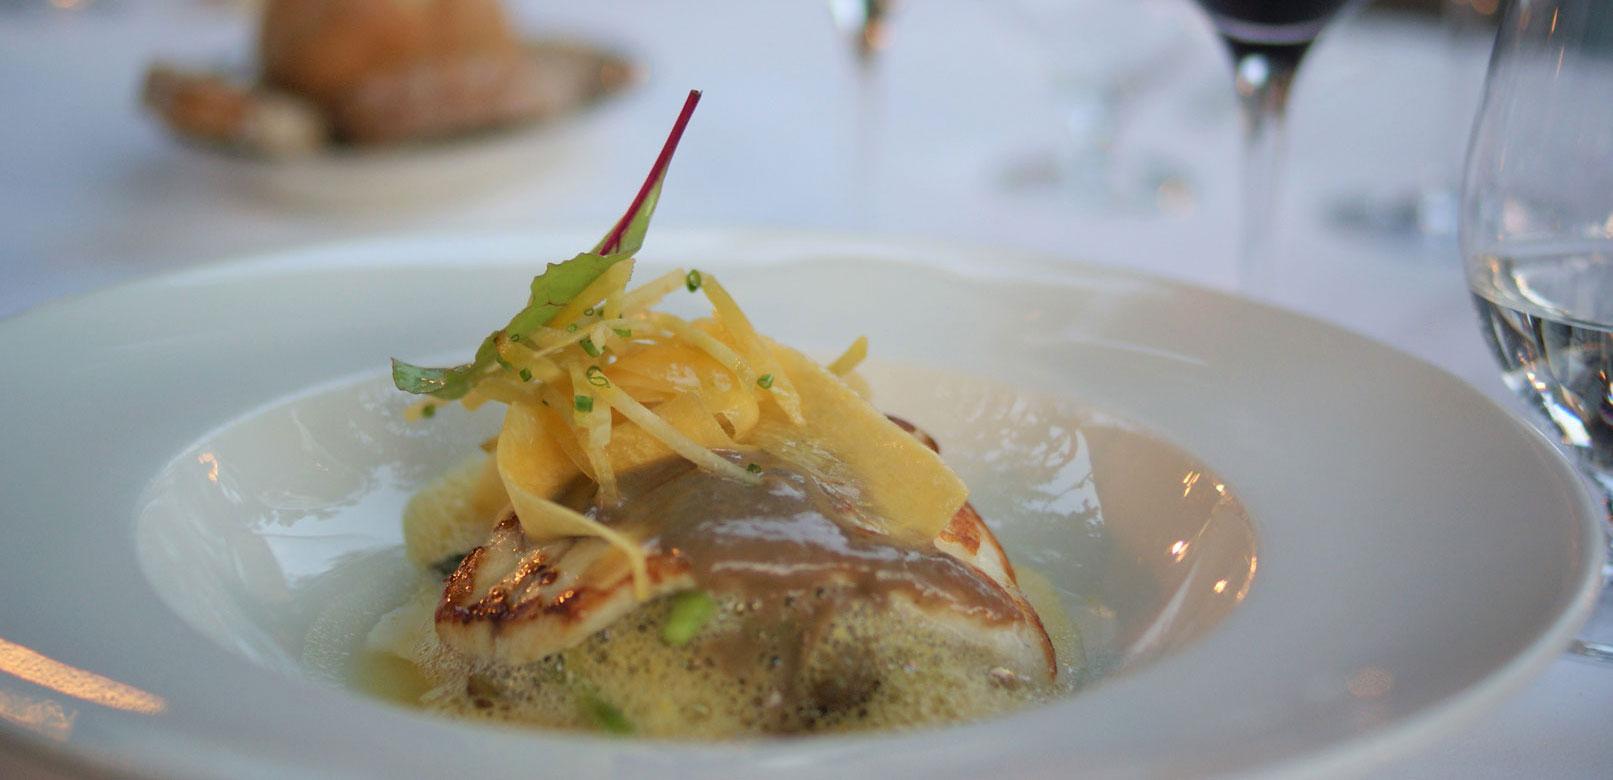 Restaurants in Vaucluse